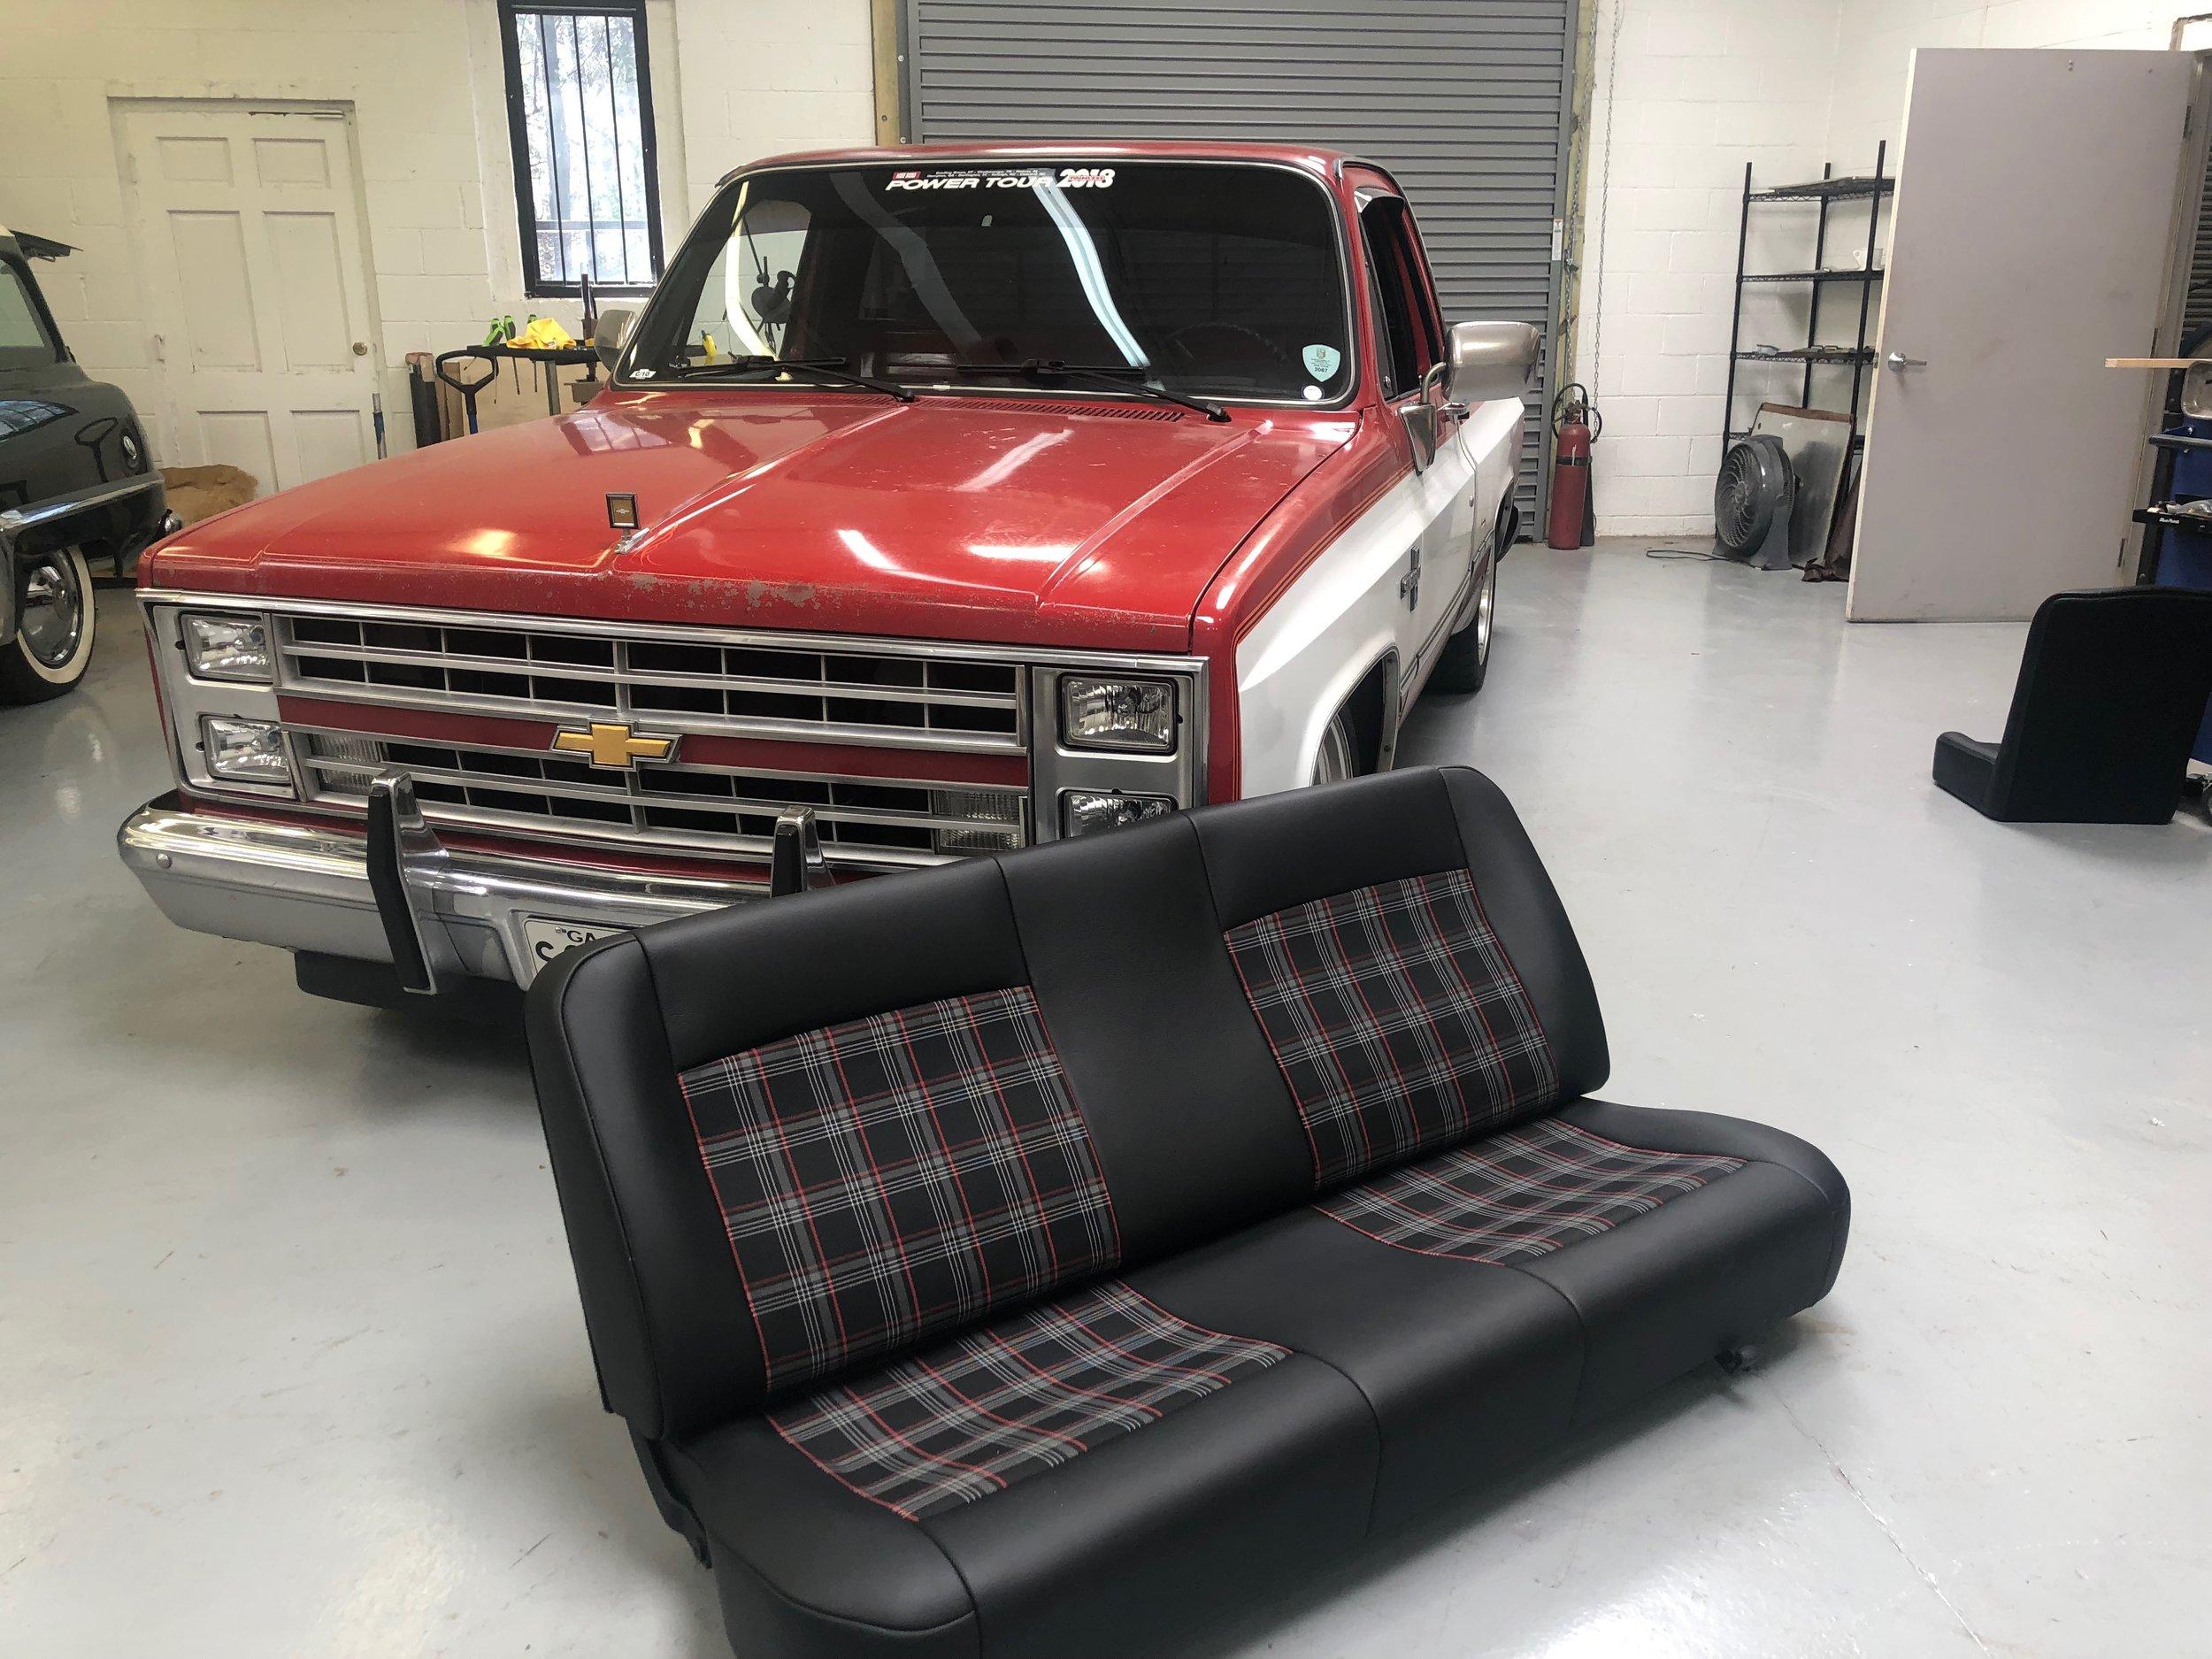 SQRBDY New Seat.jpeg